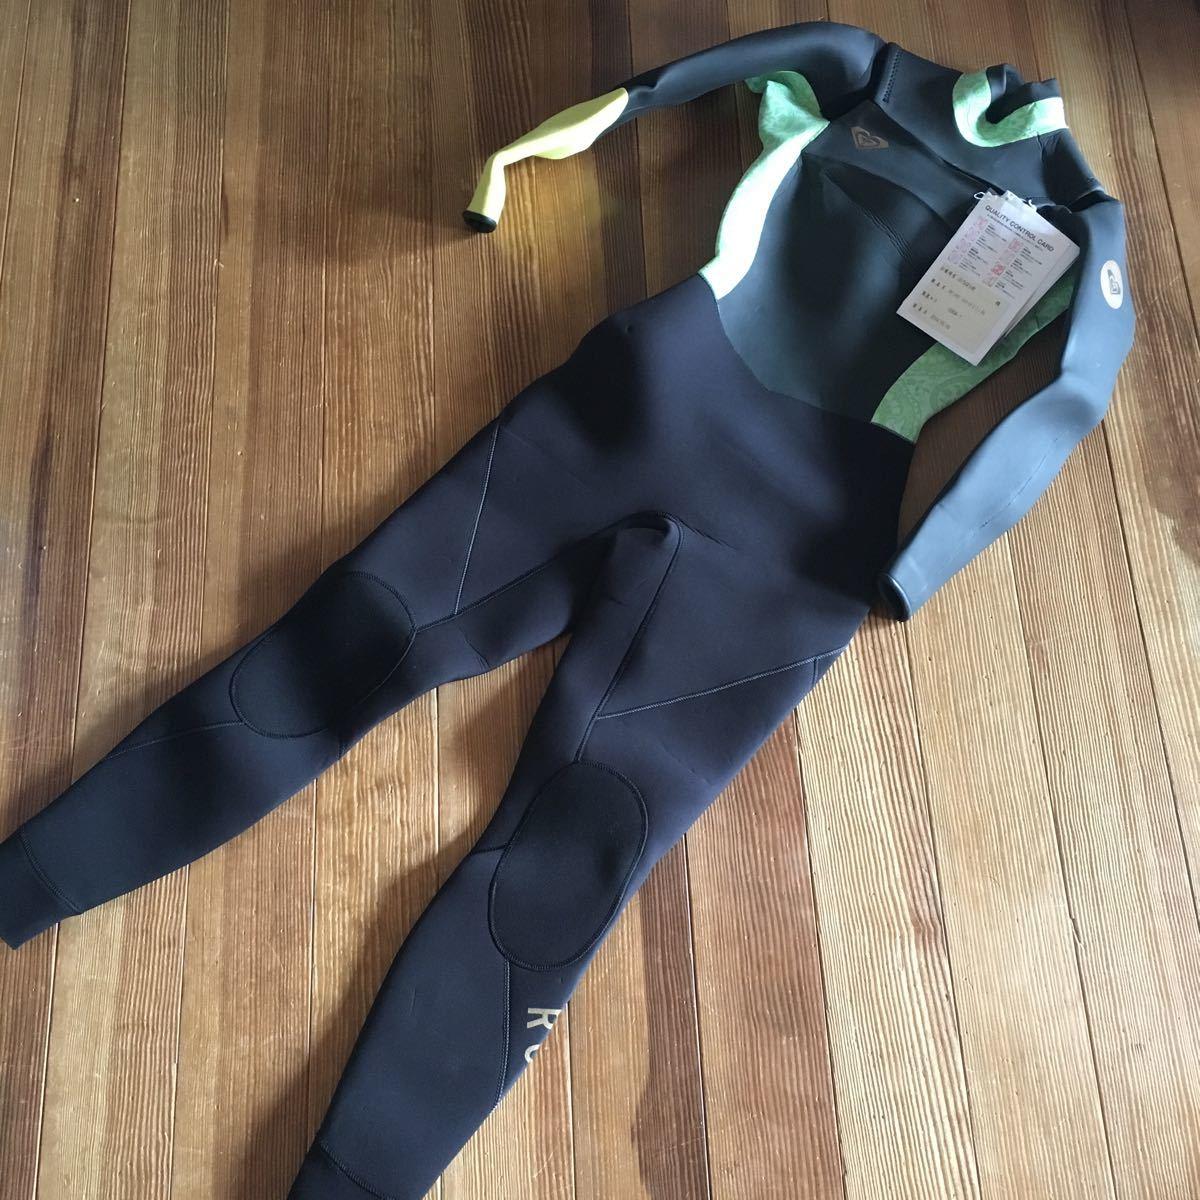 ROXY ロキシー ウェットスーツ フルスーツ 5/3mm ML 新品 未使用 定価66000円(税抜)_画像1